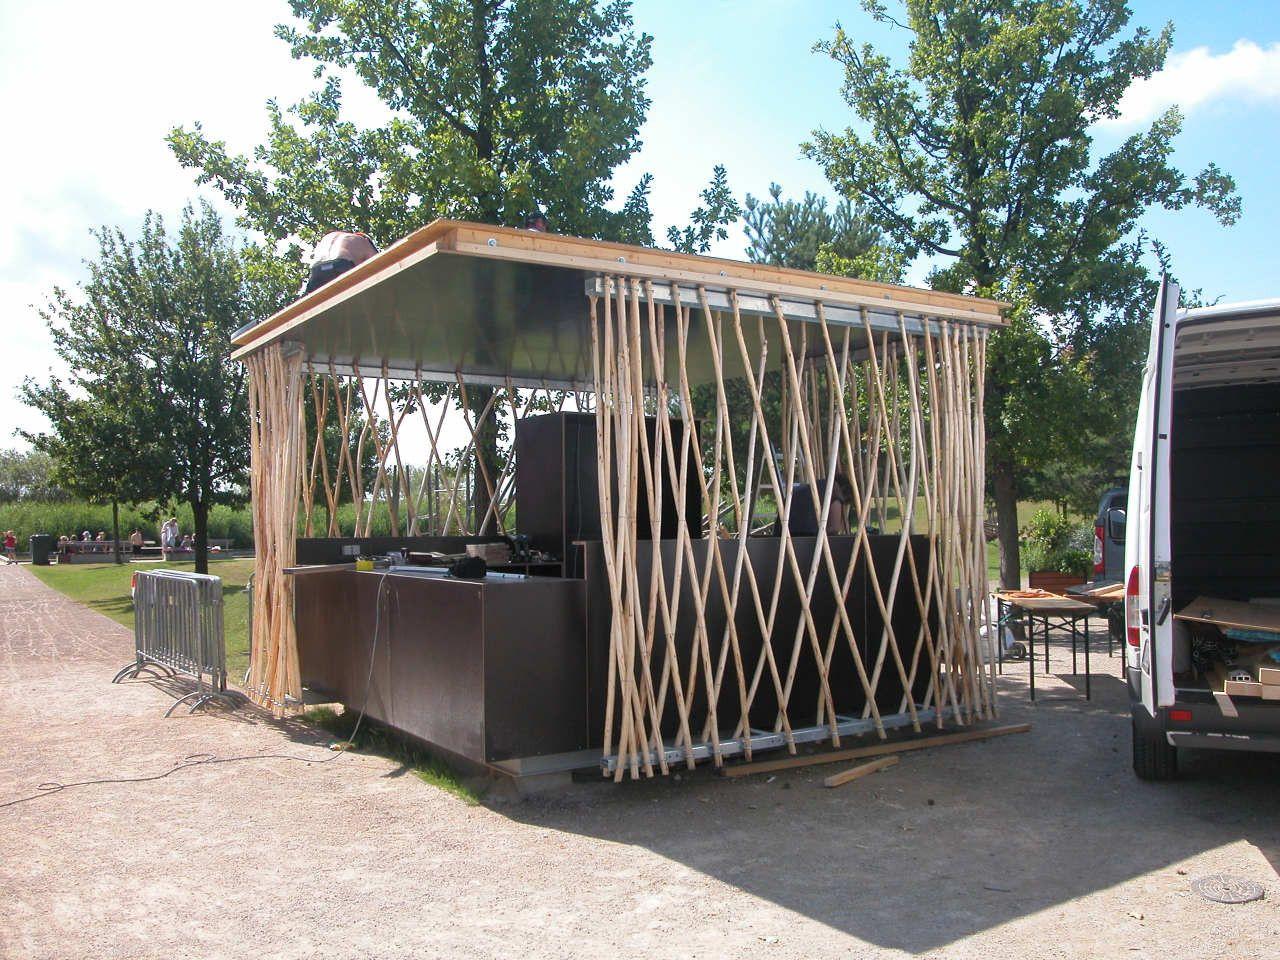 Simple-Tech-Kiosk / partnerundpartner-architekten | Kiosk, Potsdam ...